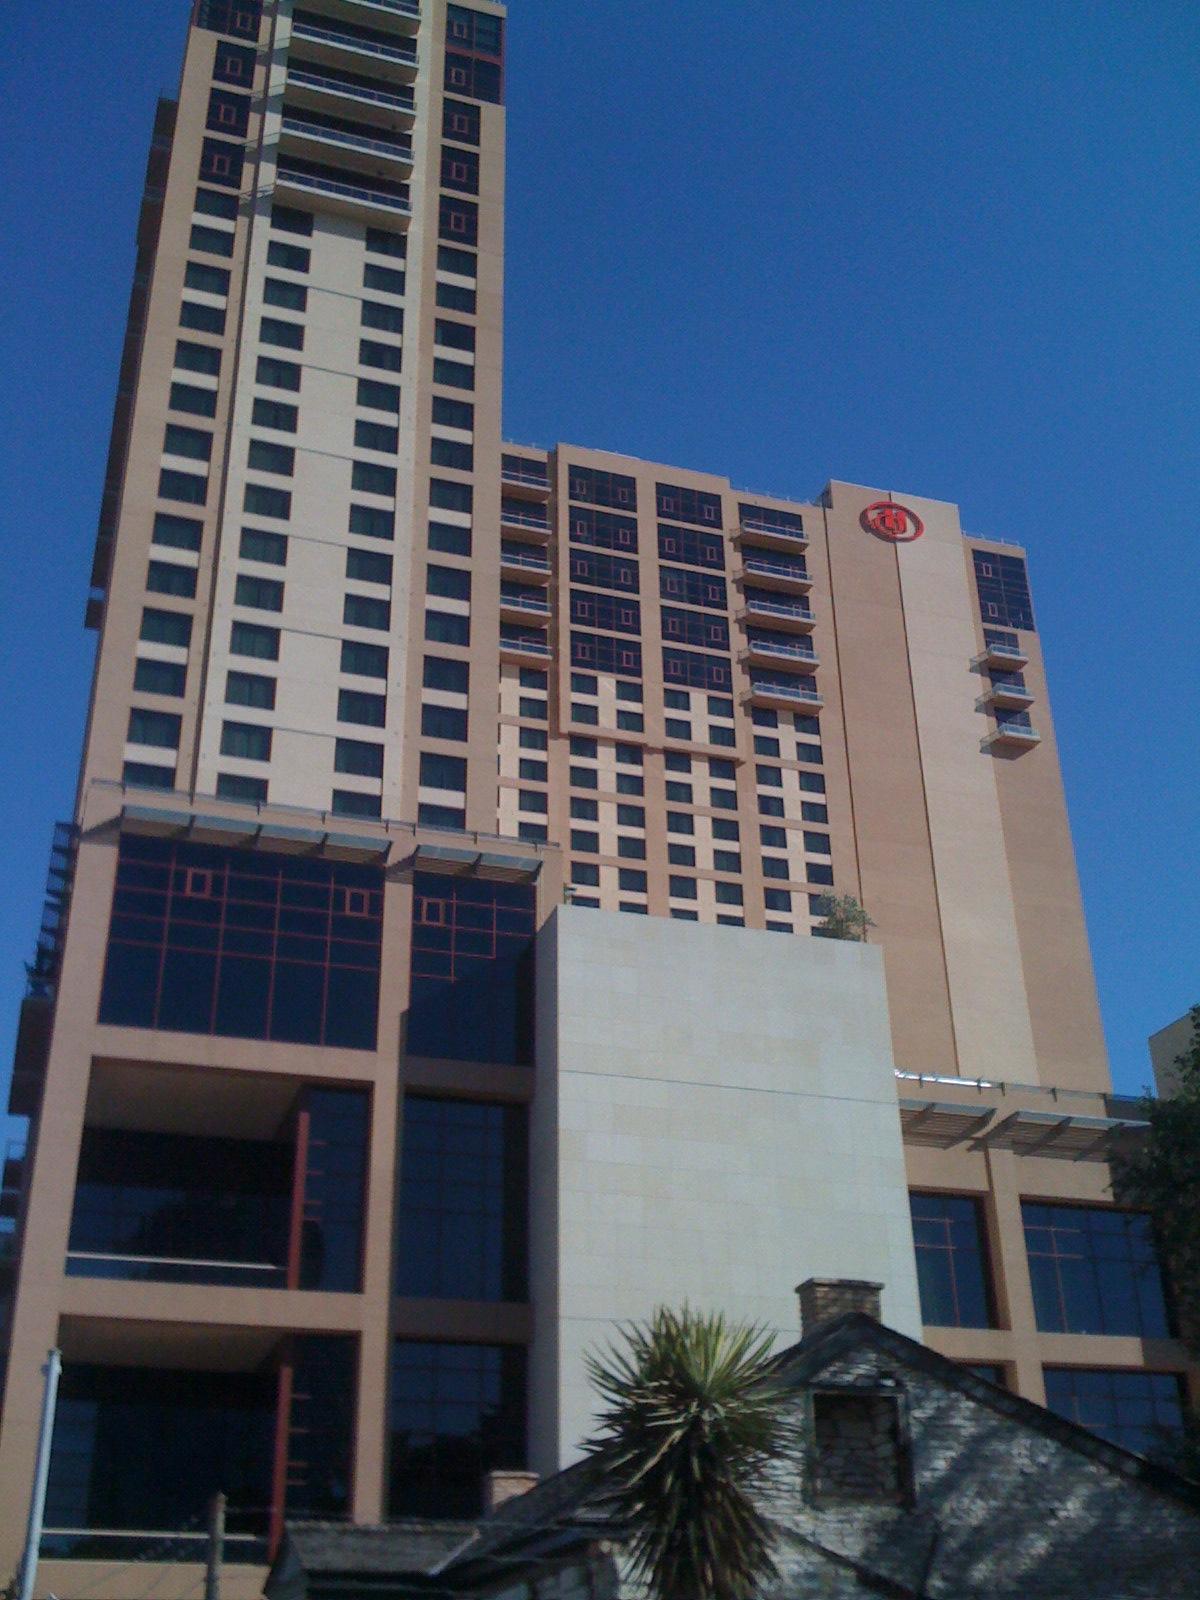 Hilton Austin Hotel Wikipedia